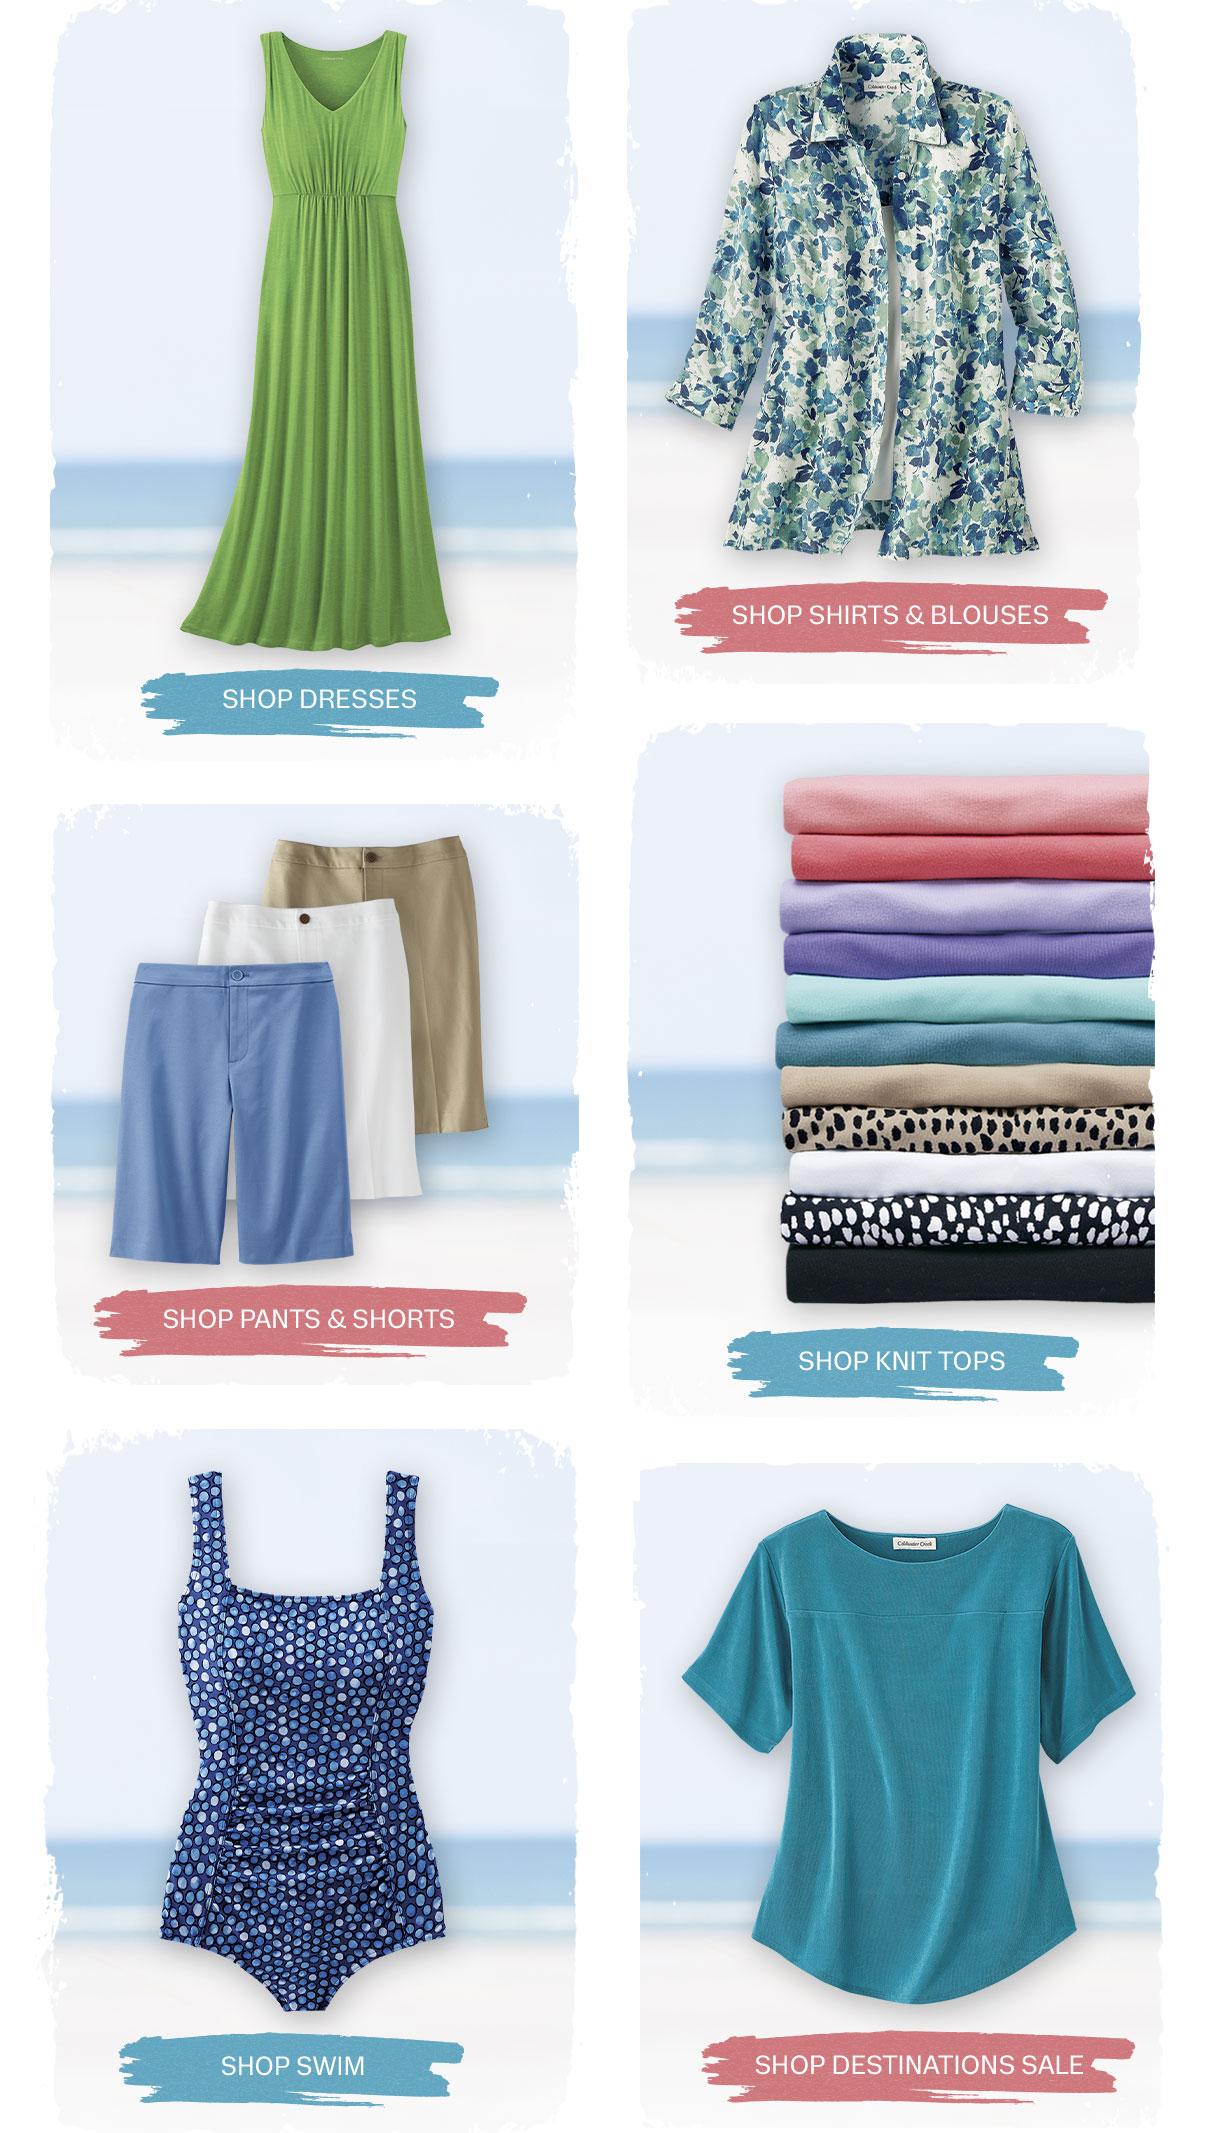 dresses shirts pants shorts swim destinations knit tops